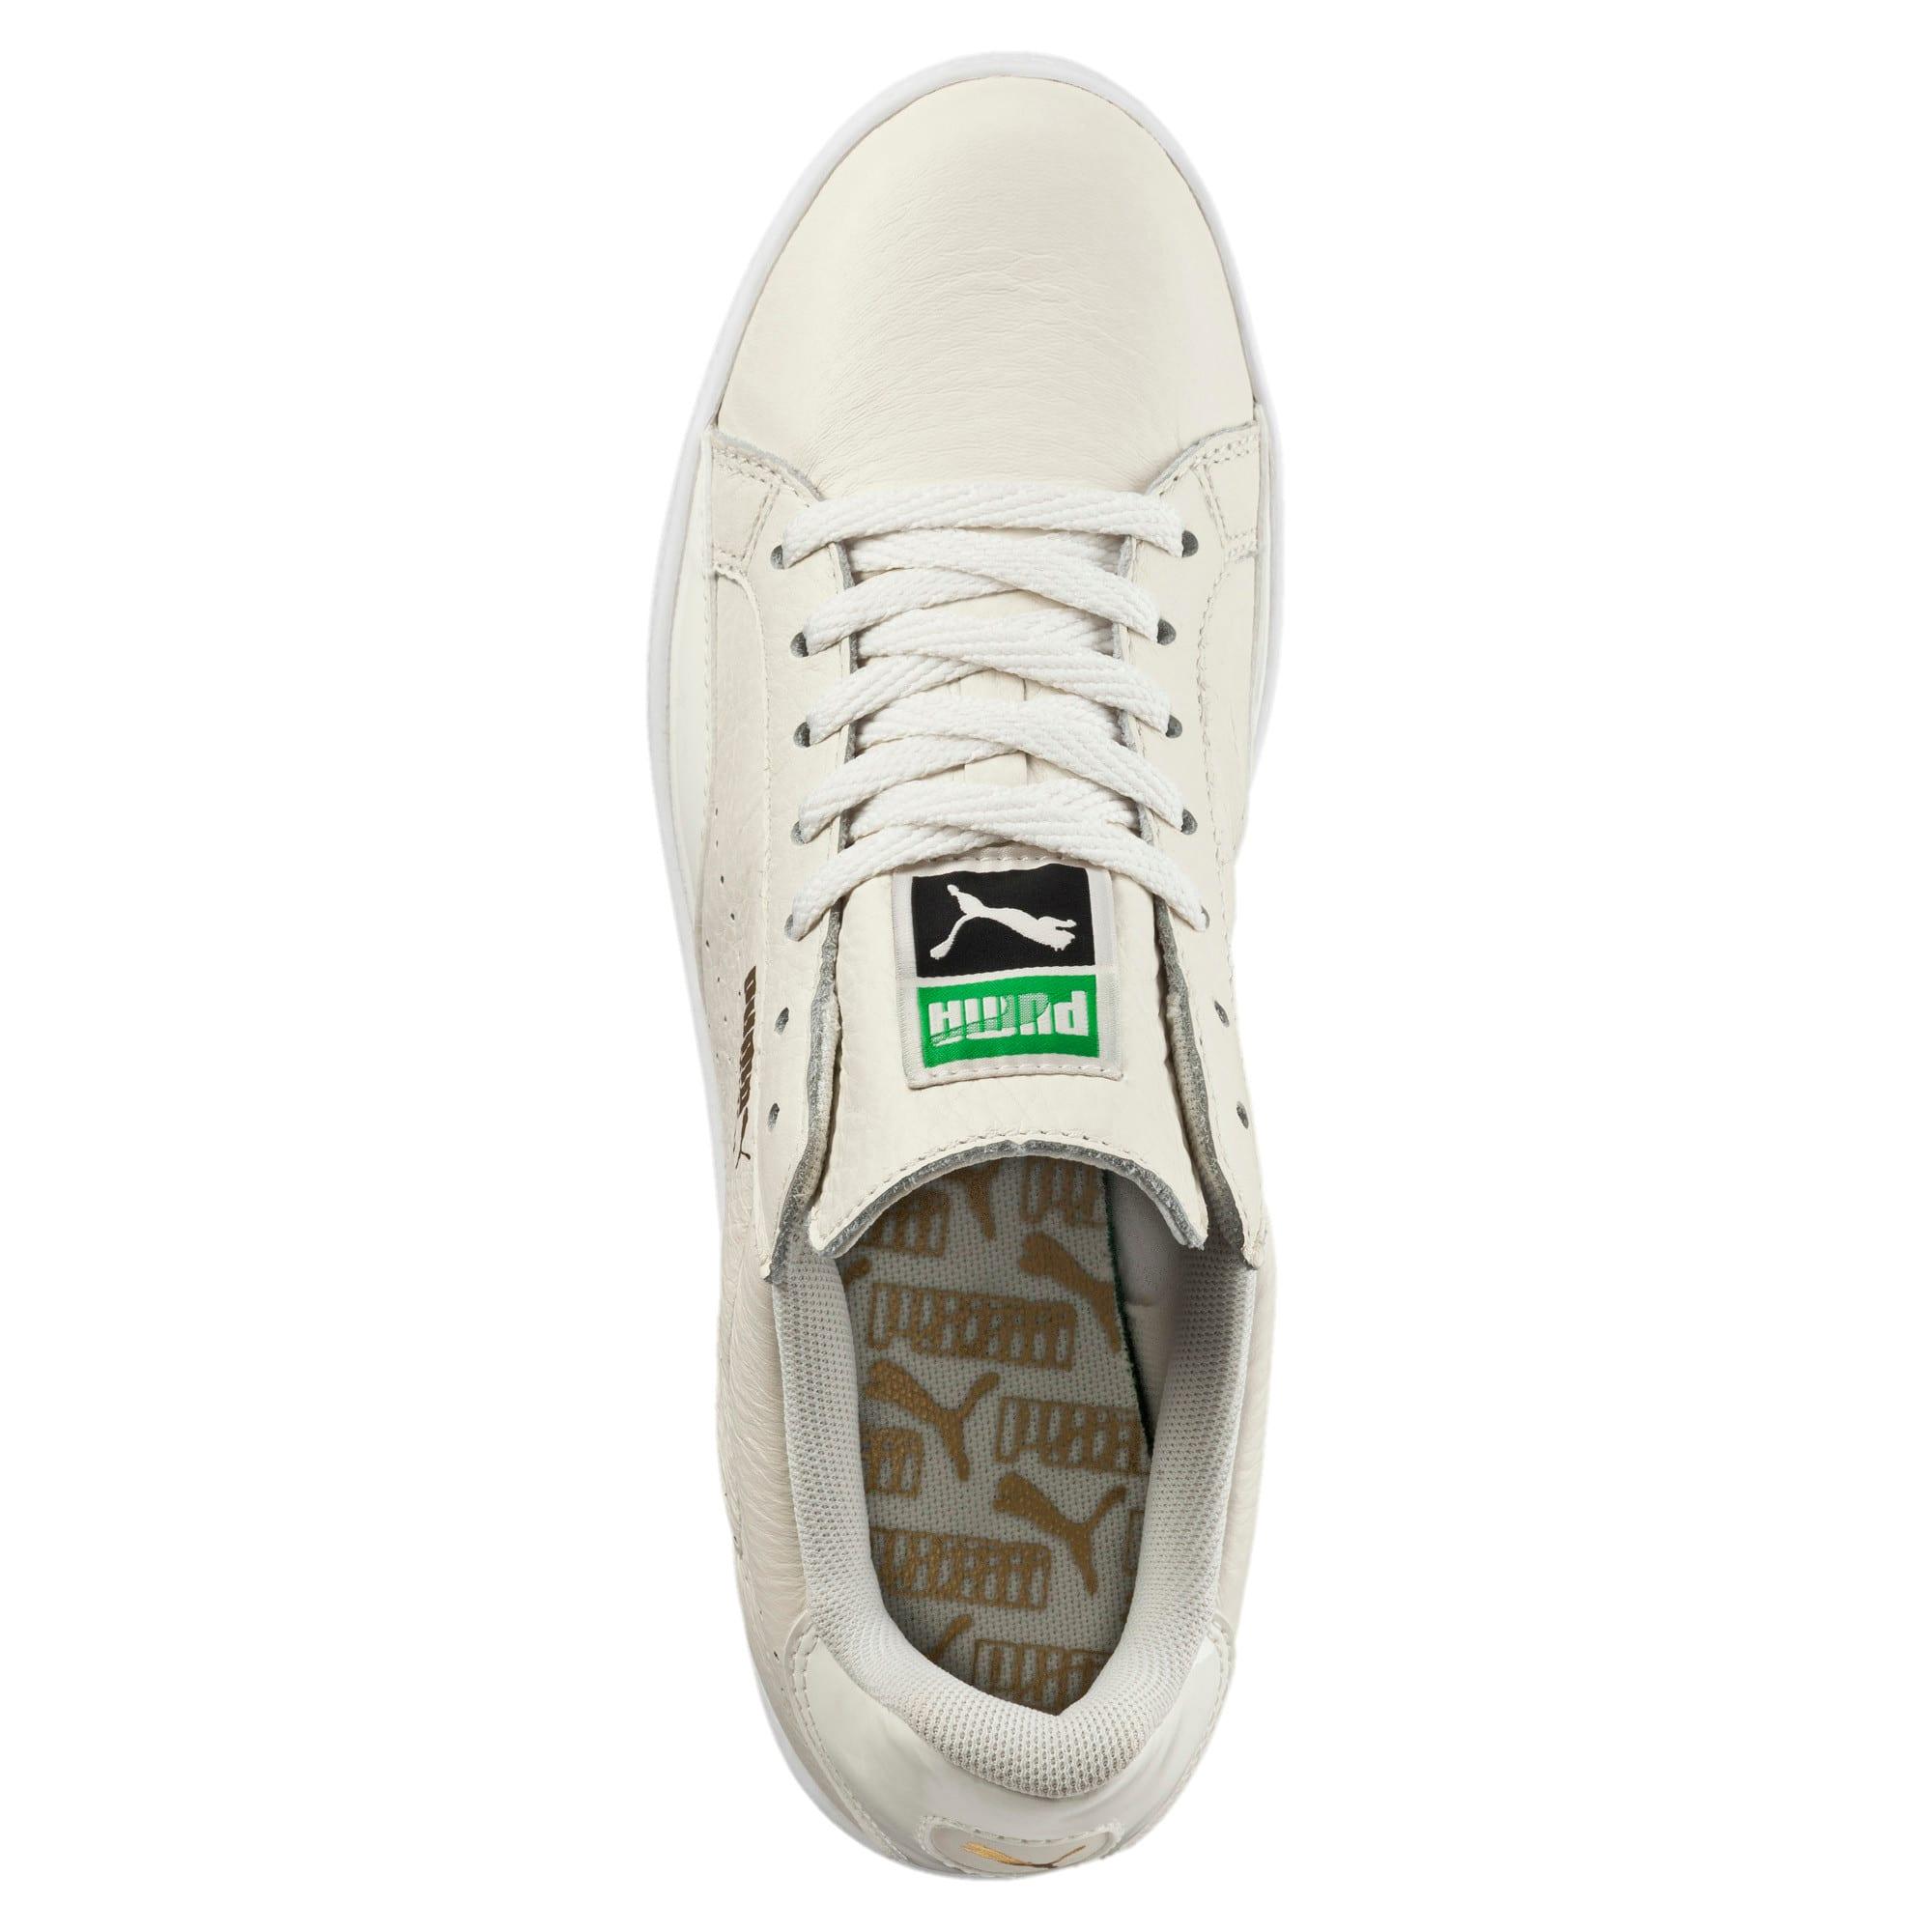 Thumbnail 5 of Match Women's Sneakers, marshmallow-white, medium